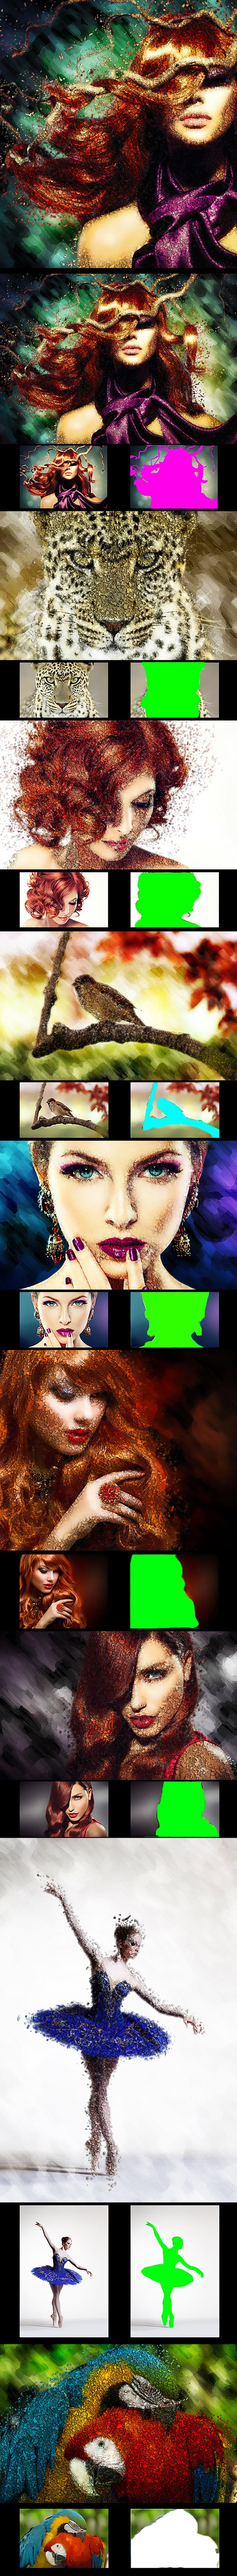 63 VSCO Photoshop Actions: Artistic Actions Bundle - just $9 - 3 2